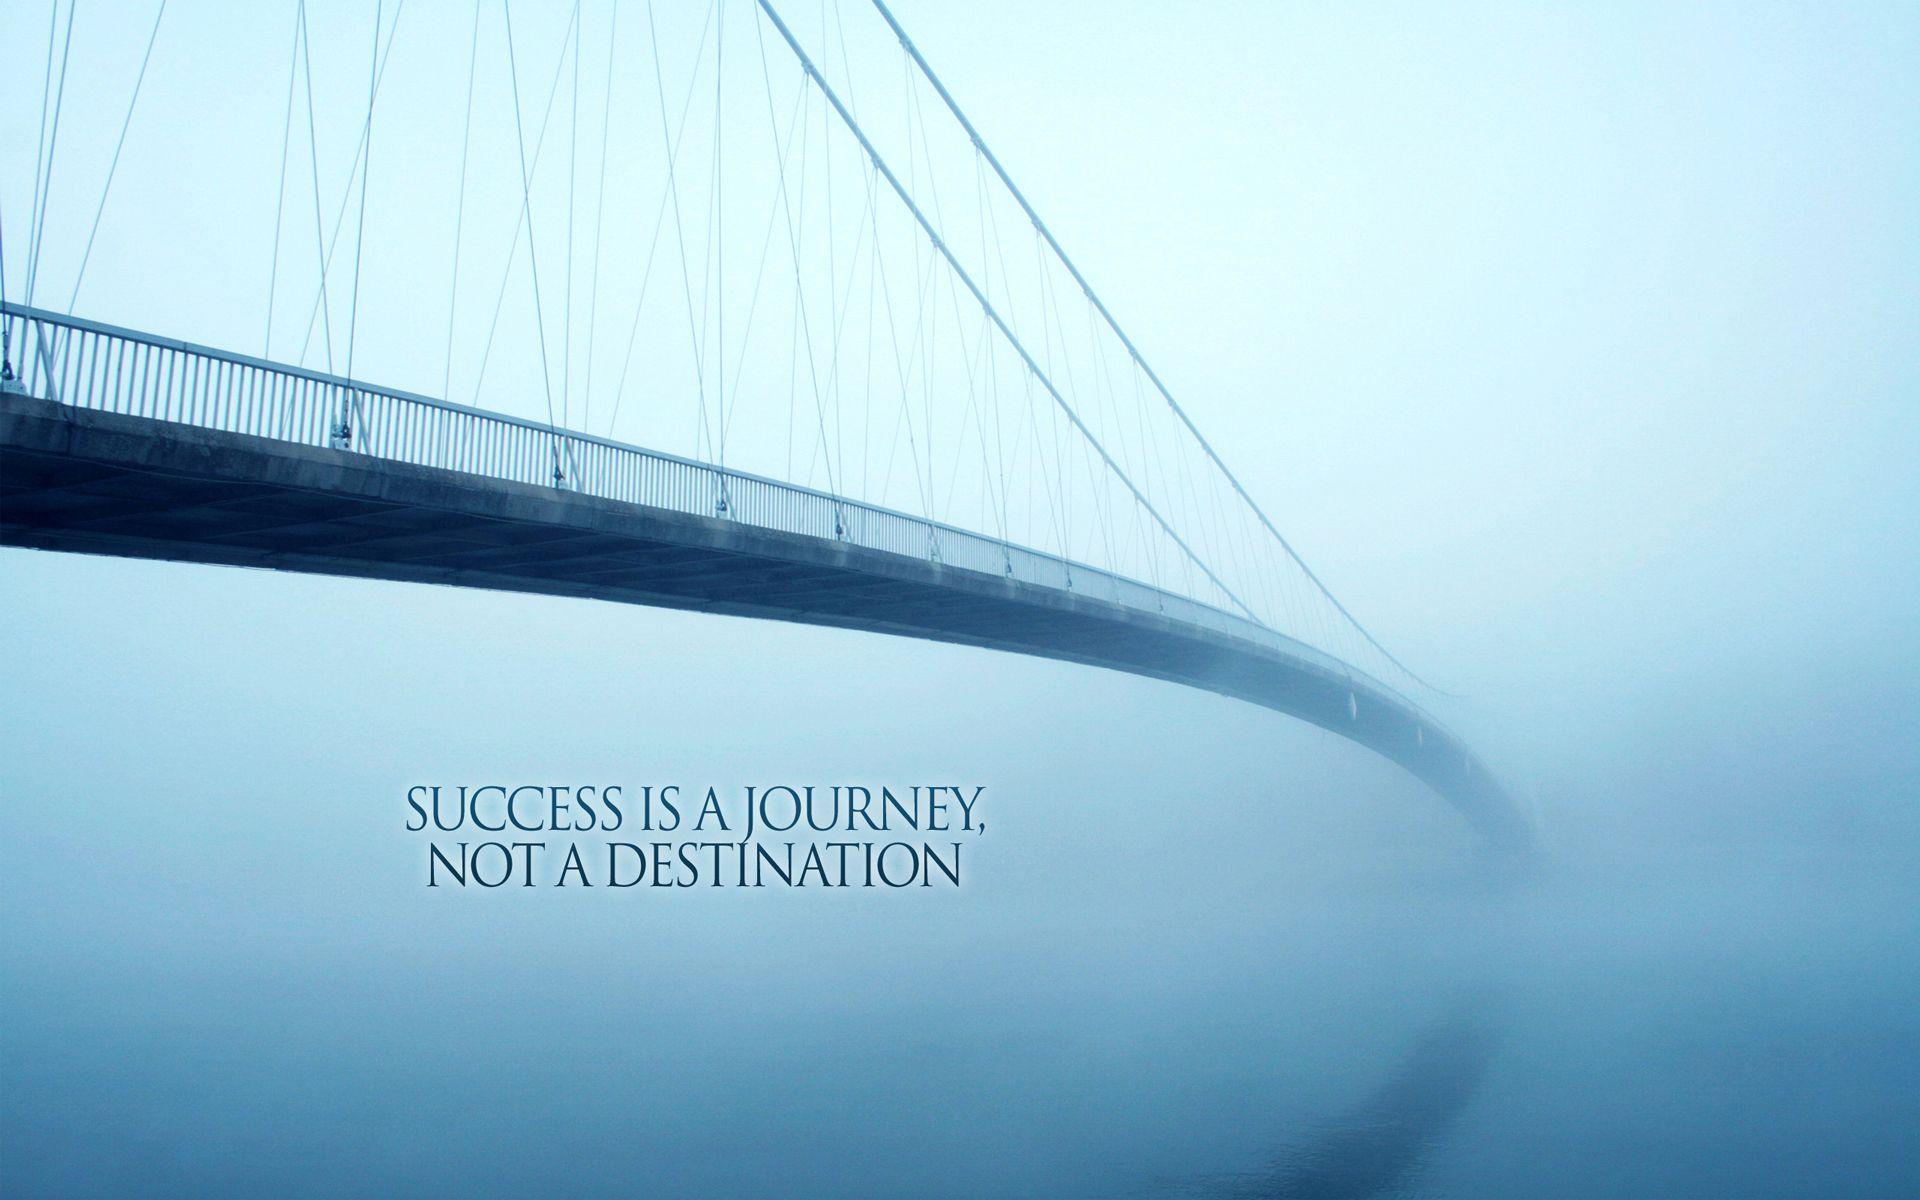 Free Download Motivational Wallpaper Hd Inspirational Quotes Wallpapers Inspirational Wallpapers Motivational Wallpaper